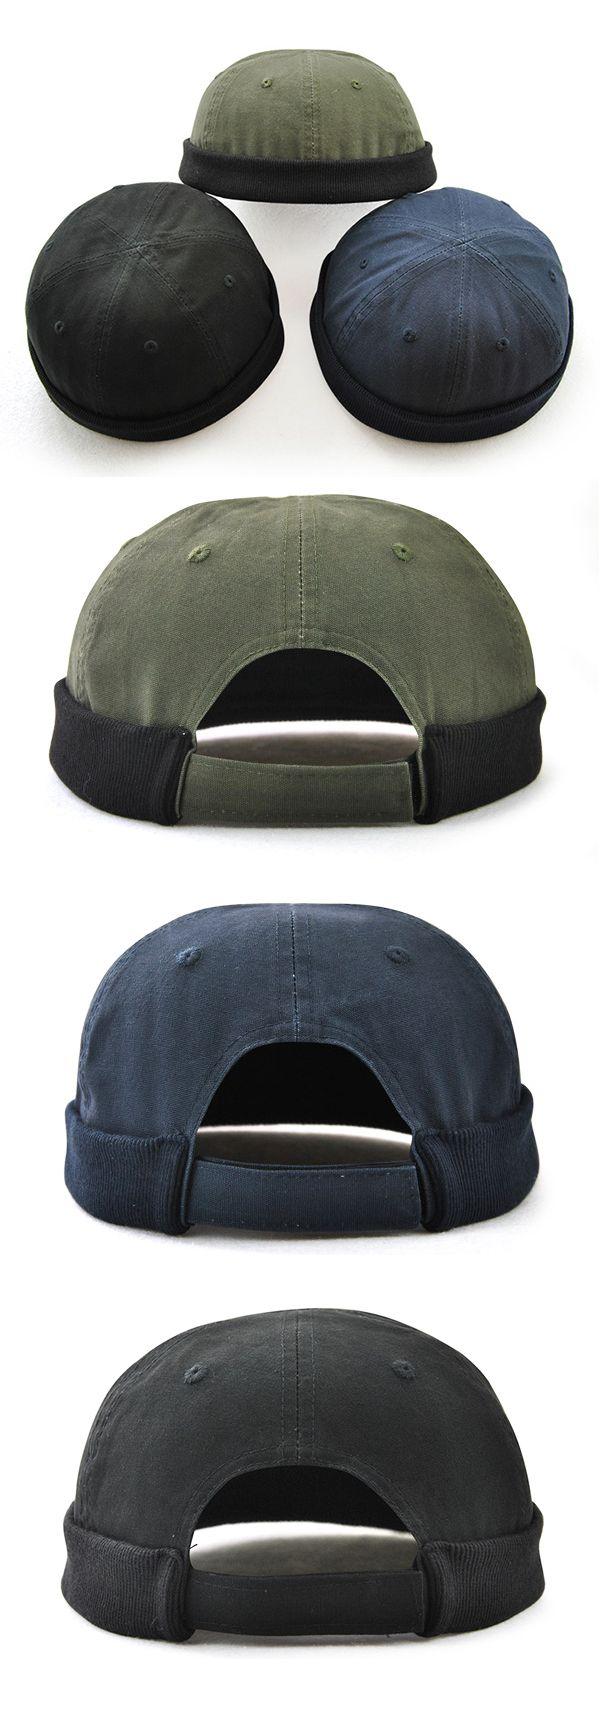 bcd9dd1f Men Women Plus Size Retro Brimless Hat Adjustable Hats For Big Head Rolled  Cuff Sailor Cap | NC* Hats & Caps | Sailor cap, Hats for big heads, Hats